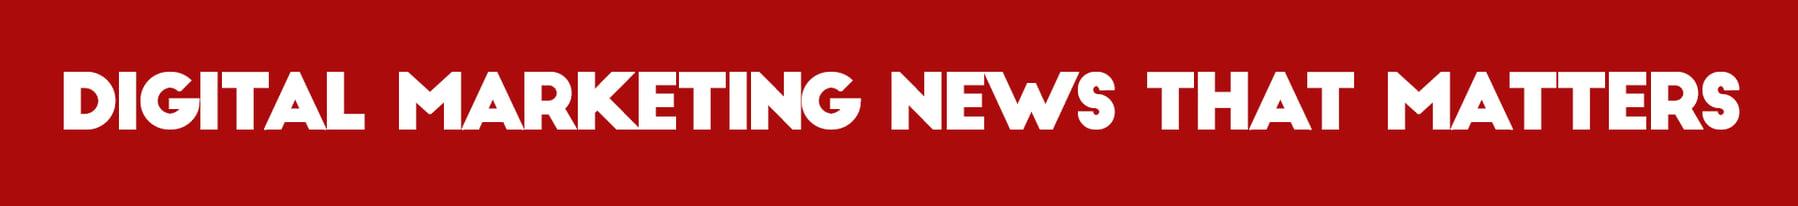 GENERAL_DIGITAL MARKETING NEWS